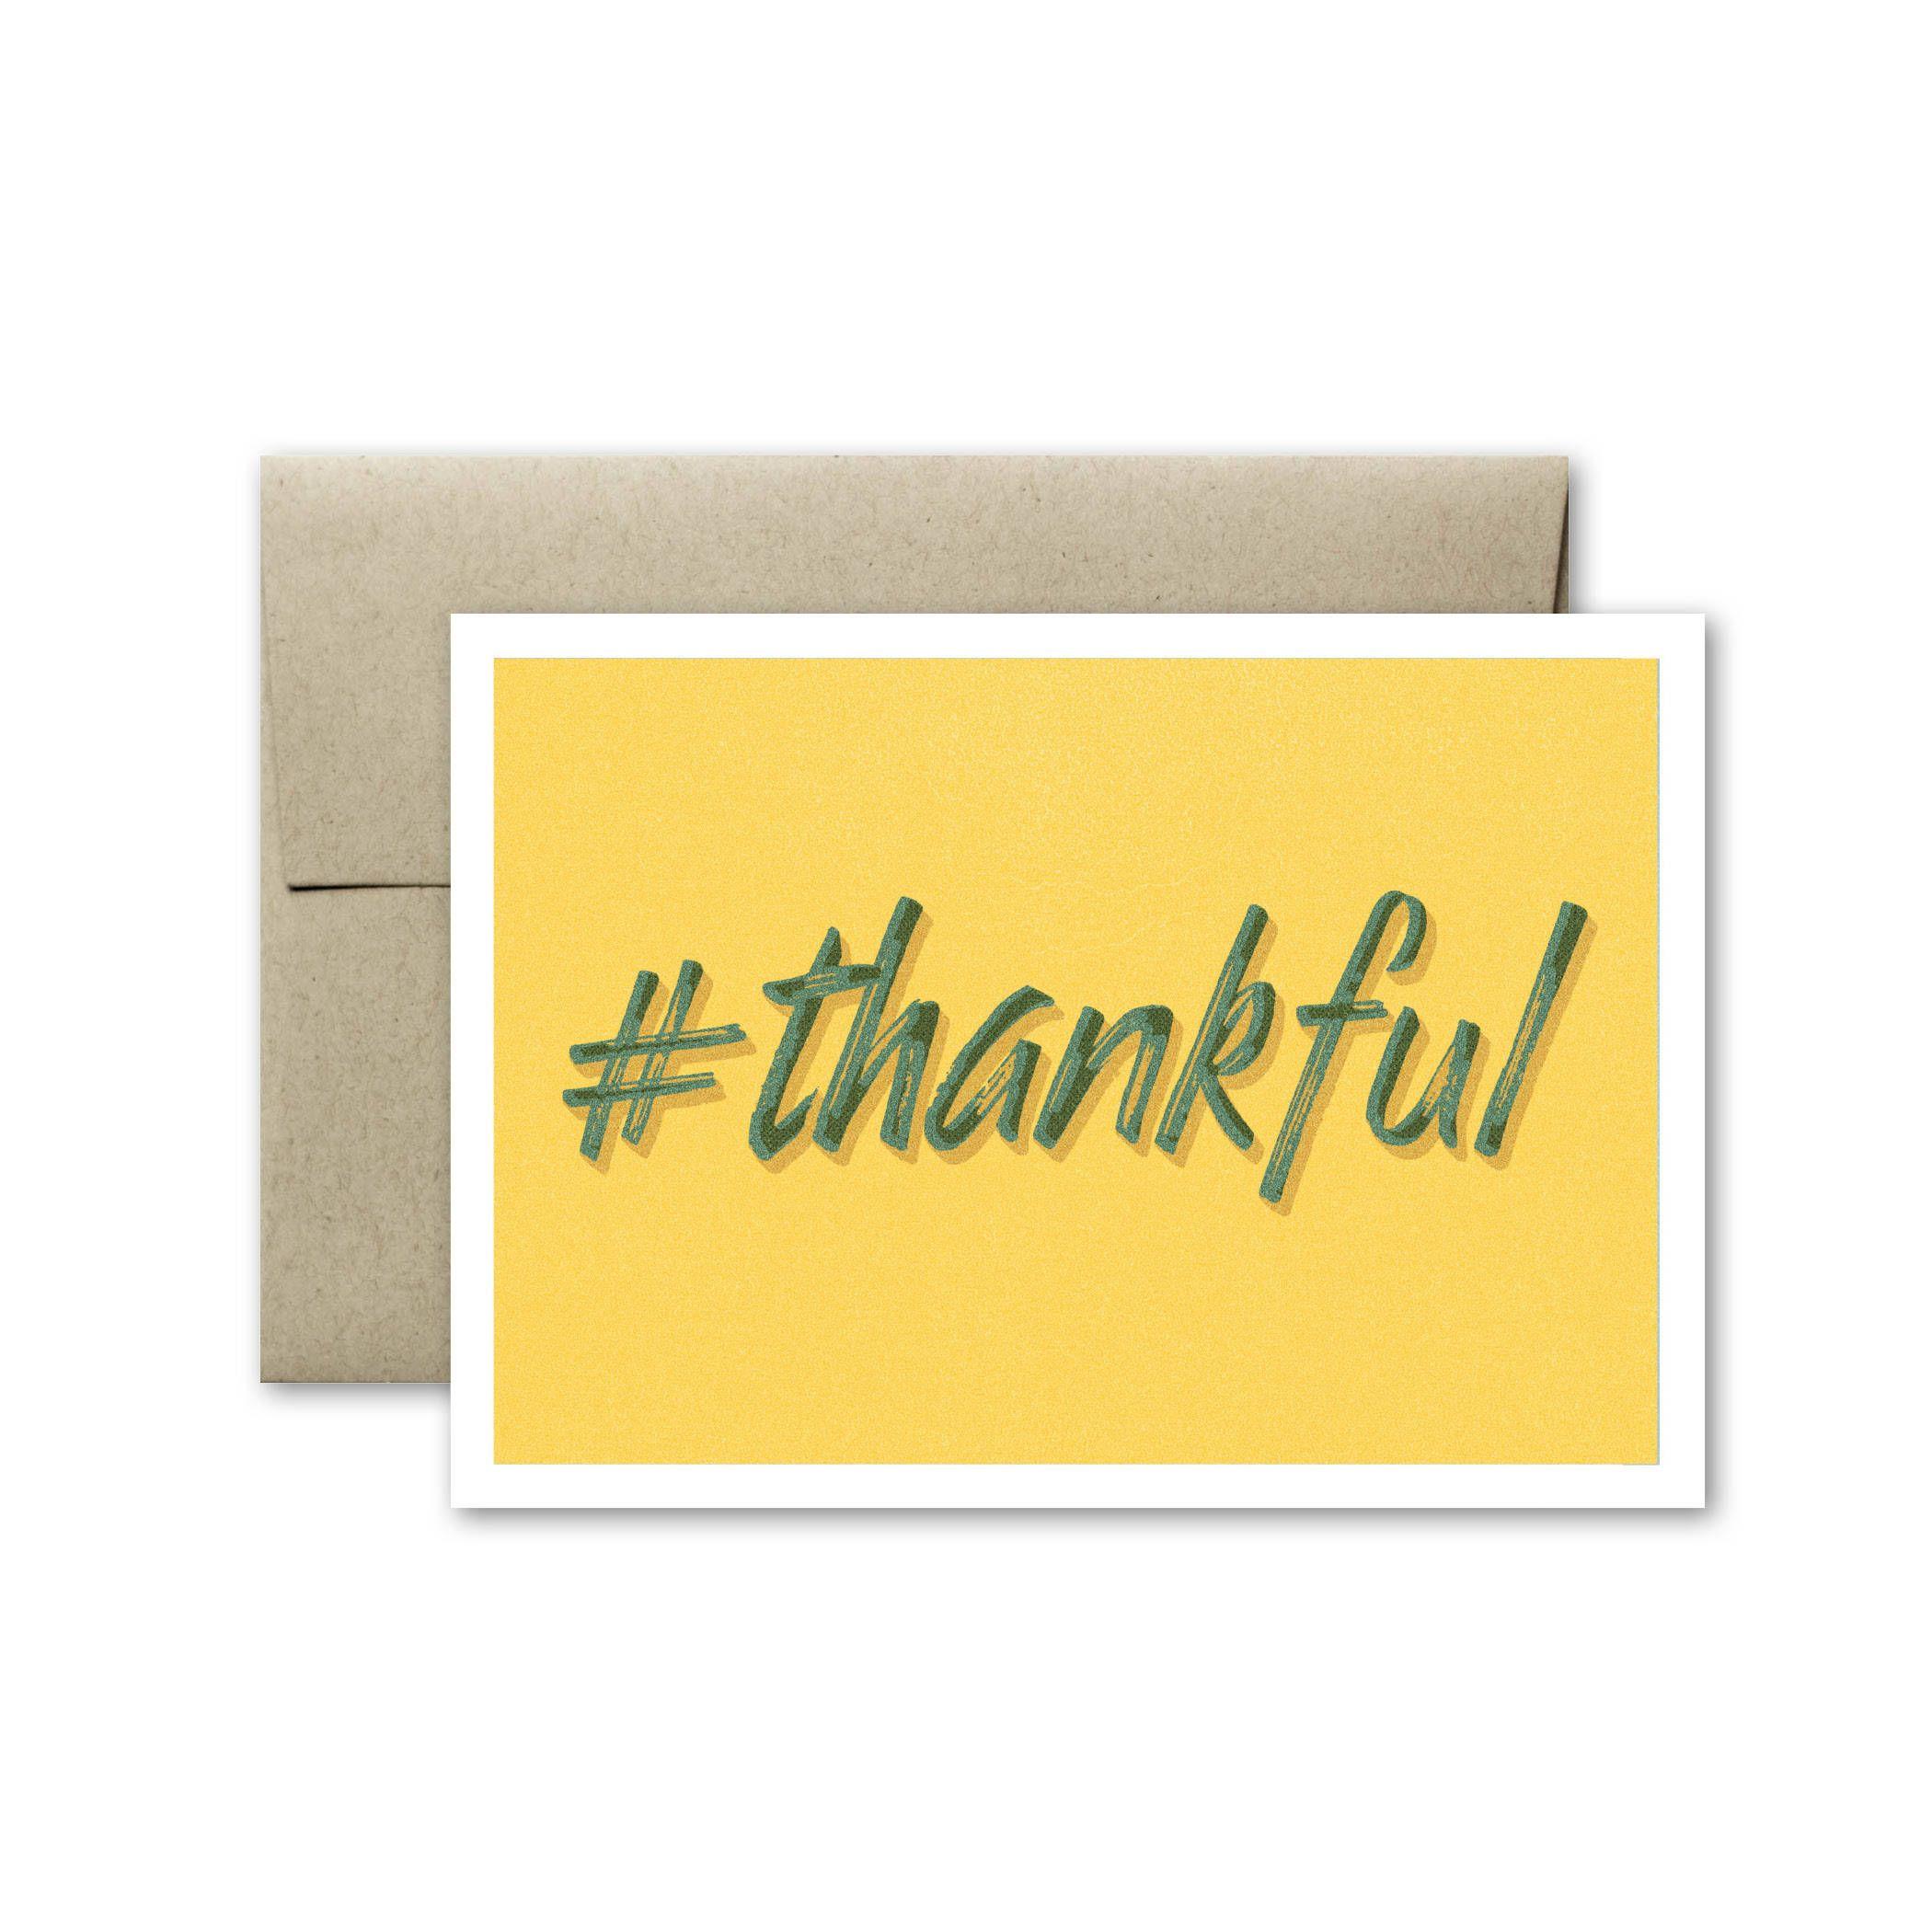 Thankful Card Thank You Card Blank Card Card Thanksgiving Card Greeting Card Wedding Thank You Card Just Because Card